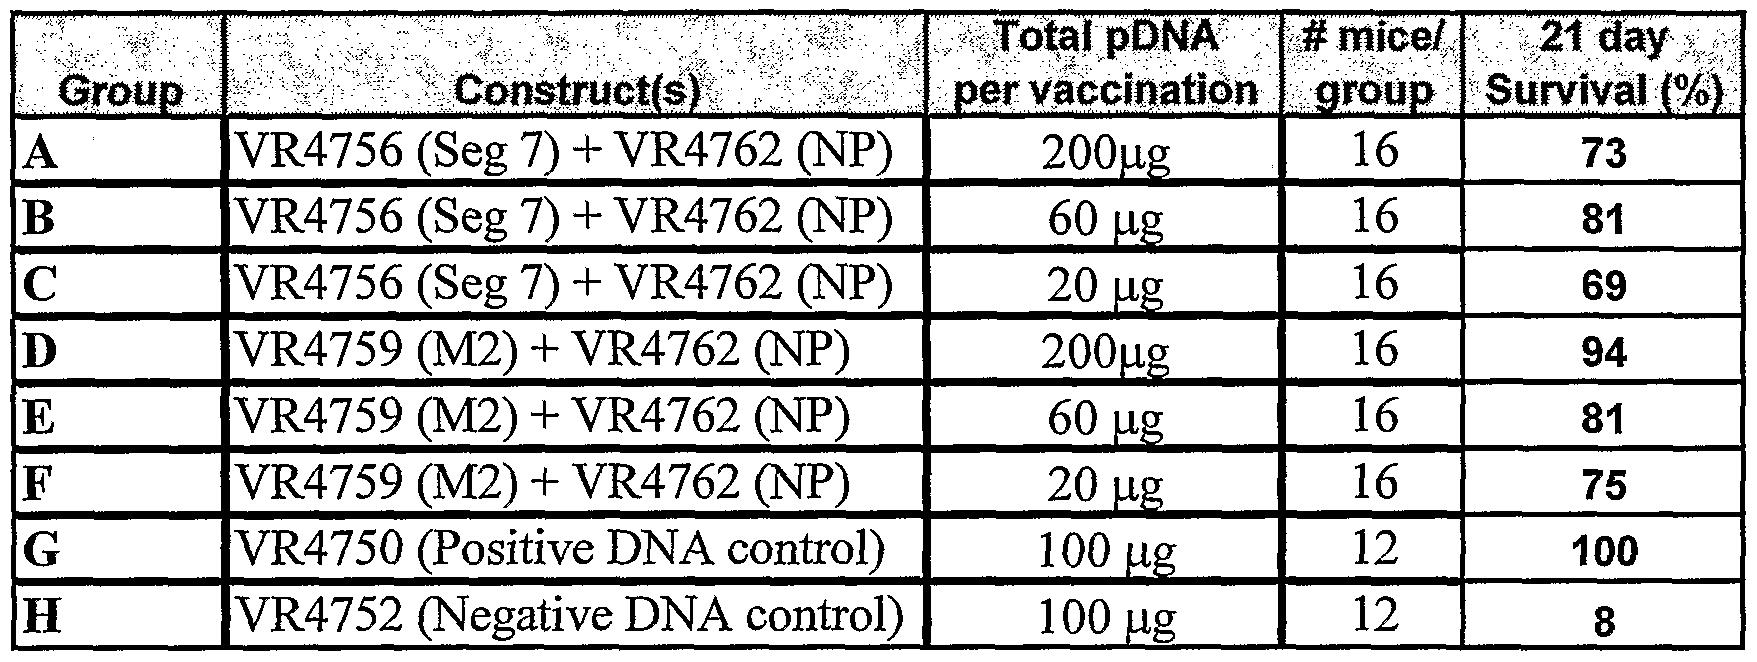 Wo2005116270A2 – Influenza Virus Vaccine Composition And For Gcu Academic Calendar 2021 20